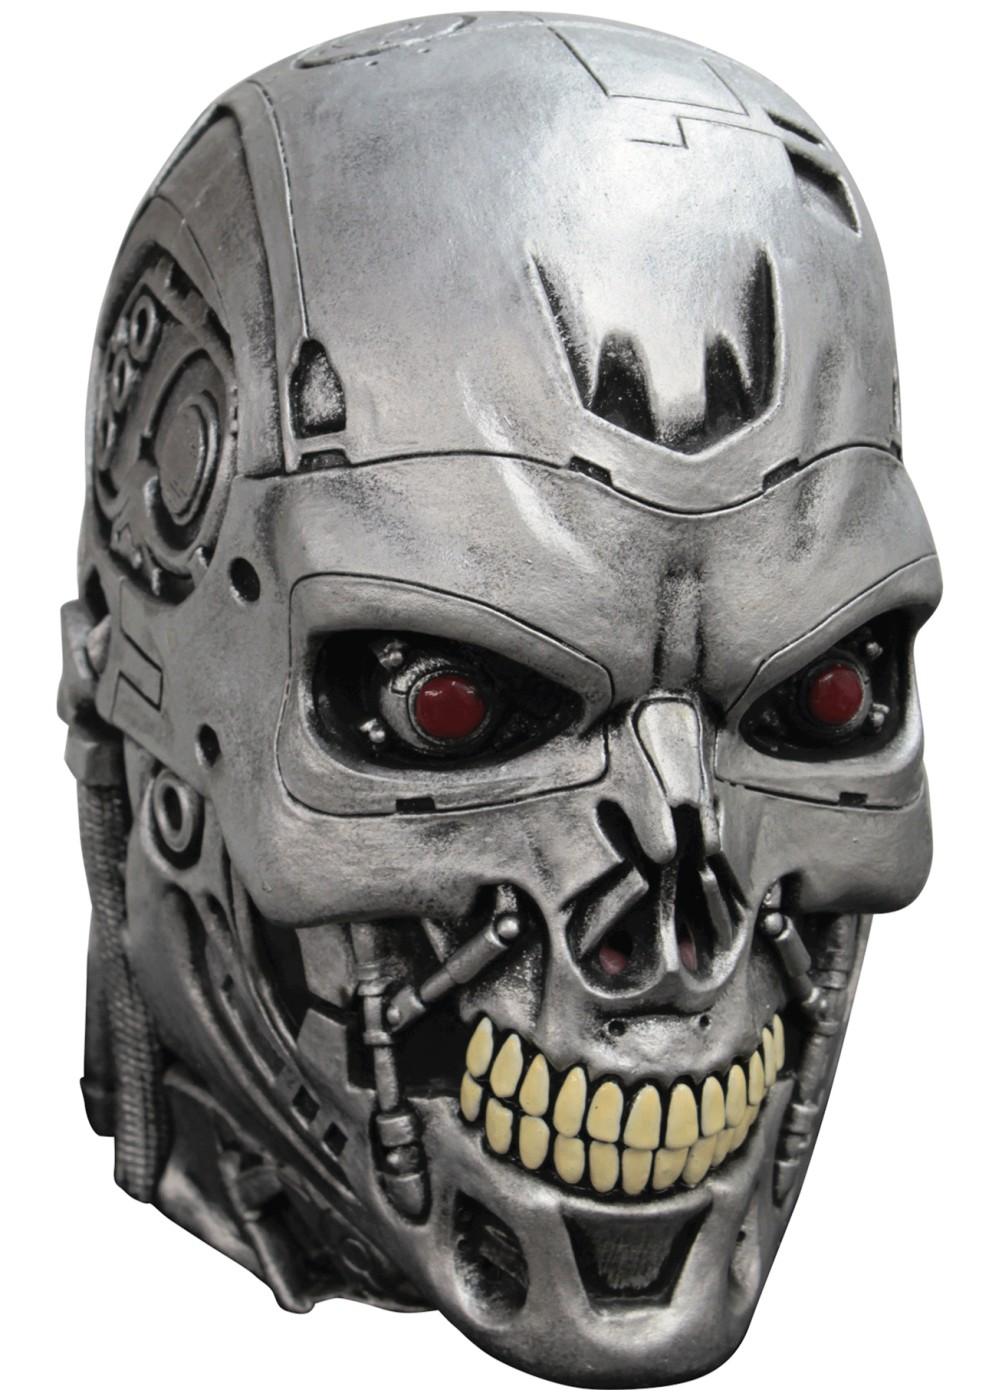 Terminator Endoskull Mask Masks